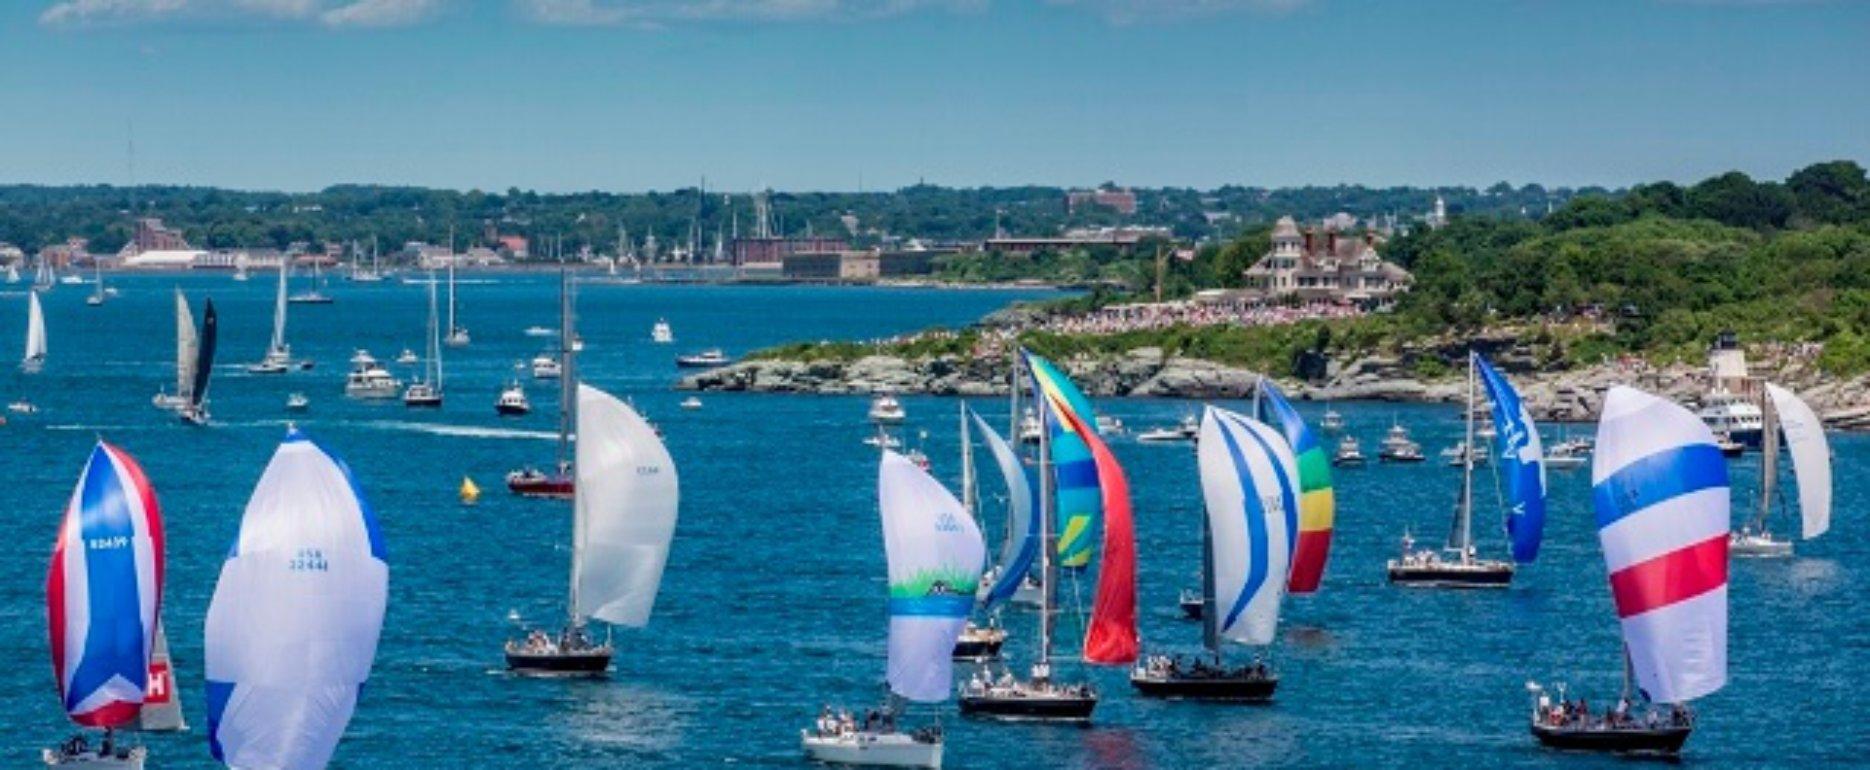 Volvo Ocean Race Spectator Sails